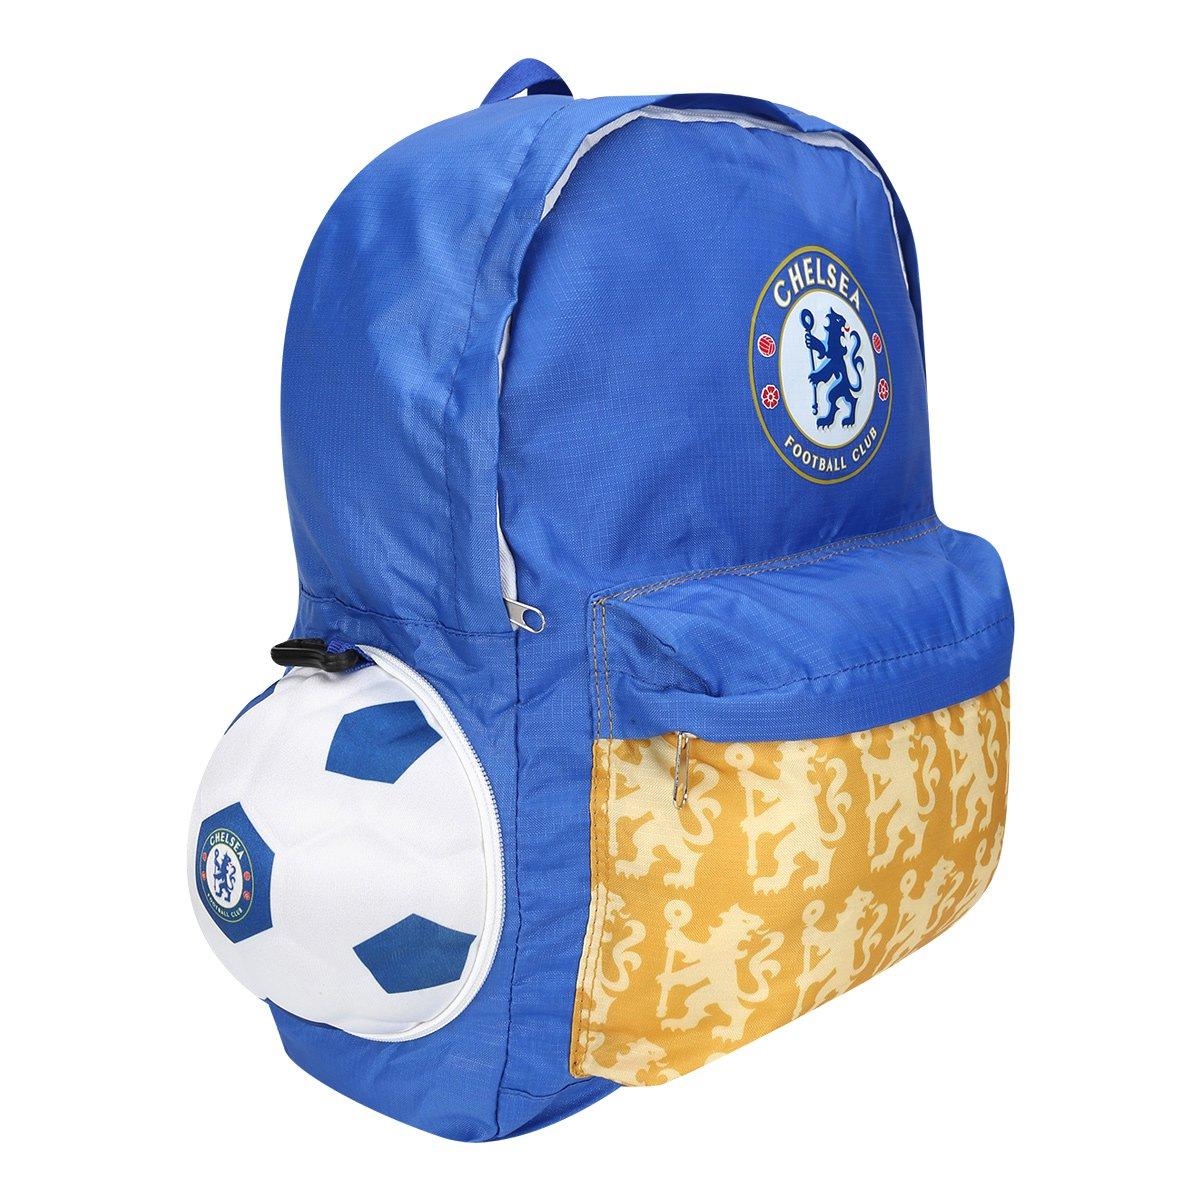 da8ab57b0d Mochila Chelsea Bola  Mochila Chelsea Bola ...